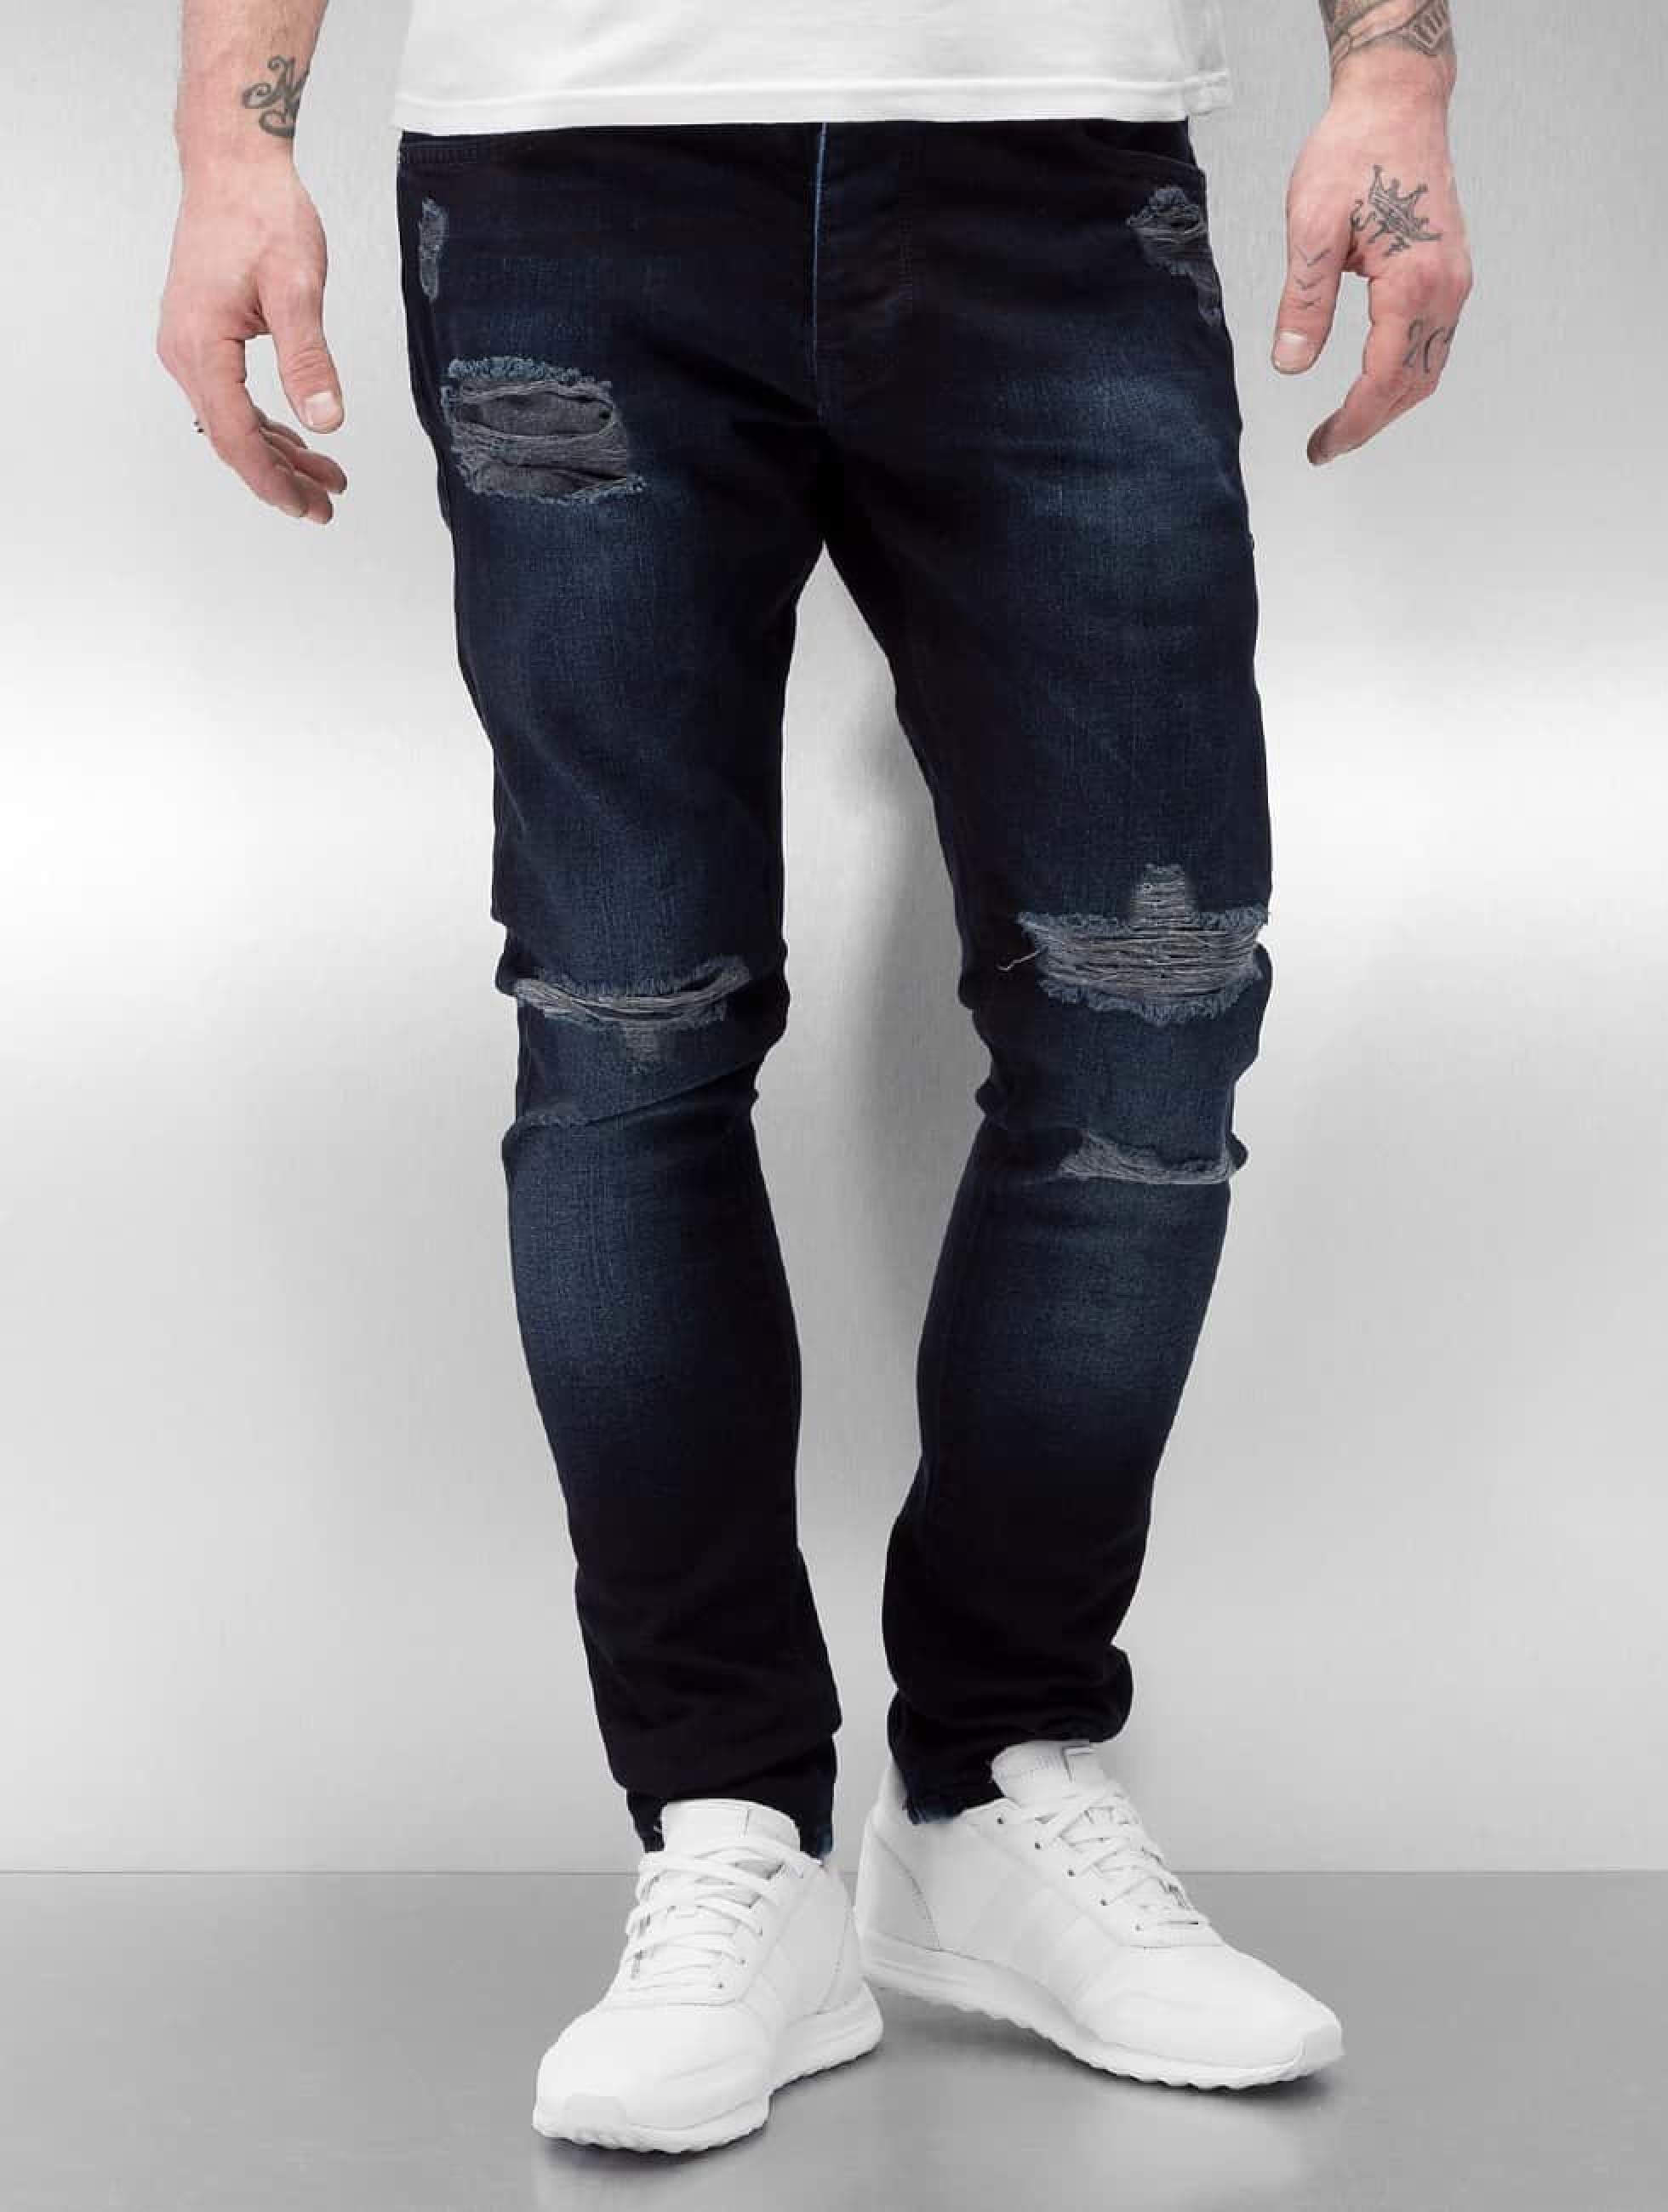 2Y / Skinny Jeans Erill in black W 30